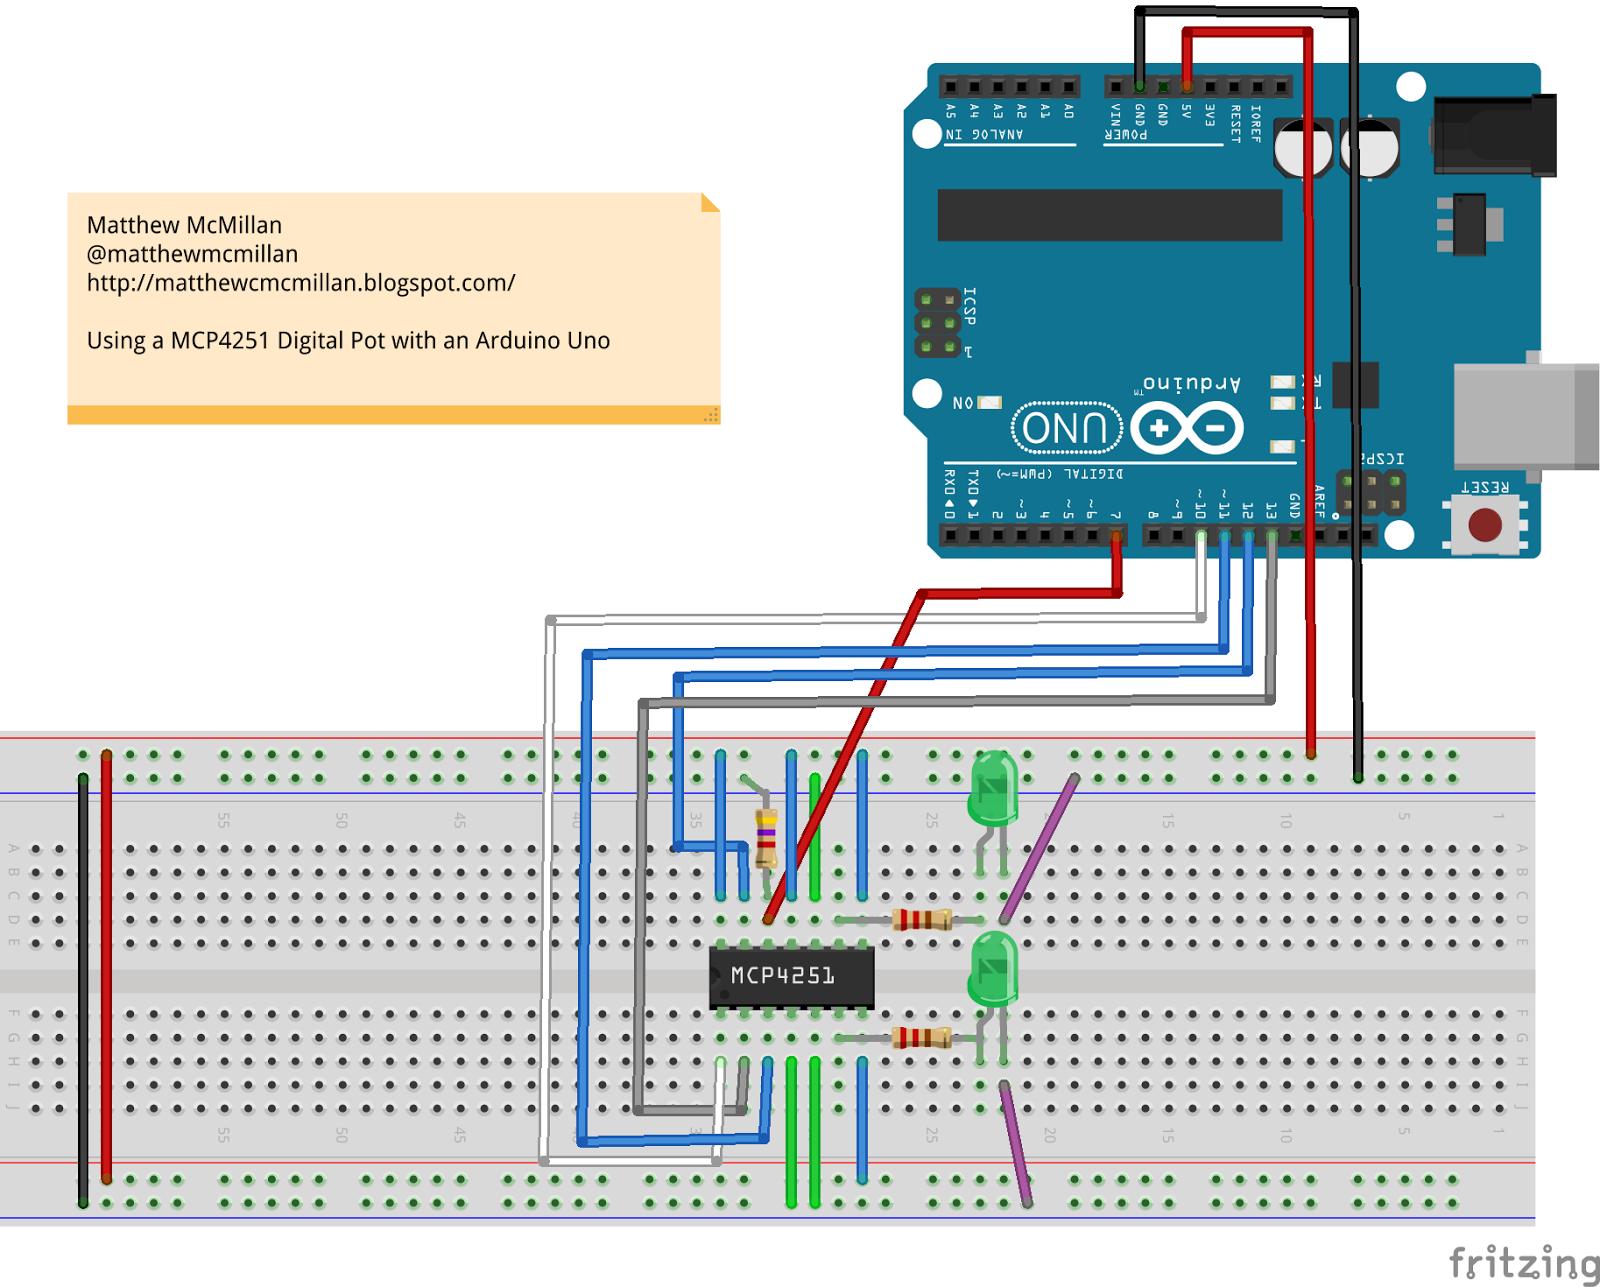 Matthew McMillan: Arduino - Using digital potentiometers part 2 ...